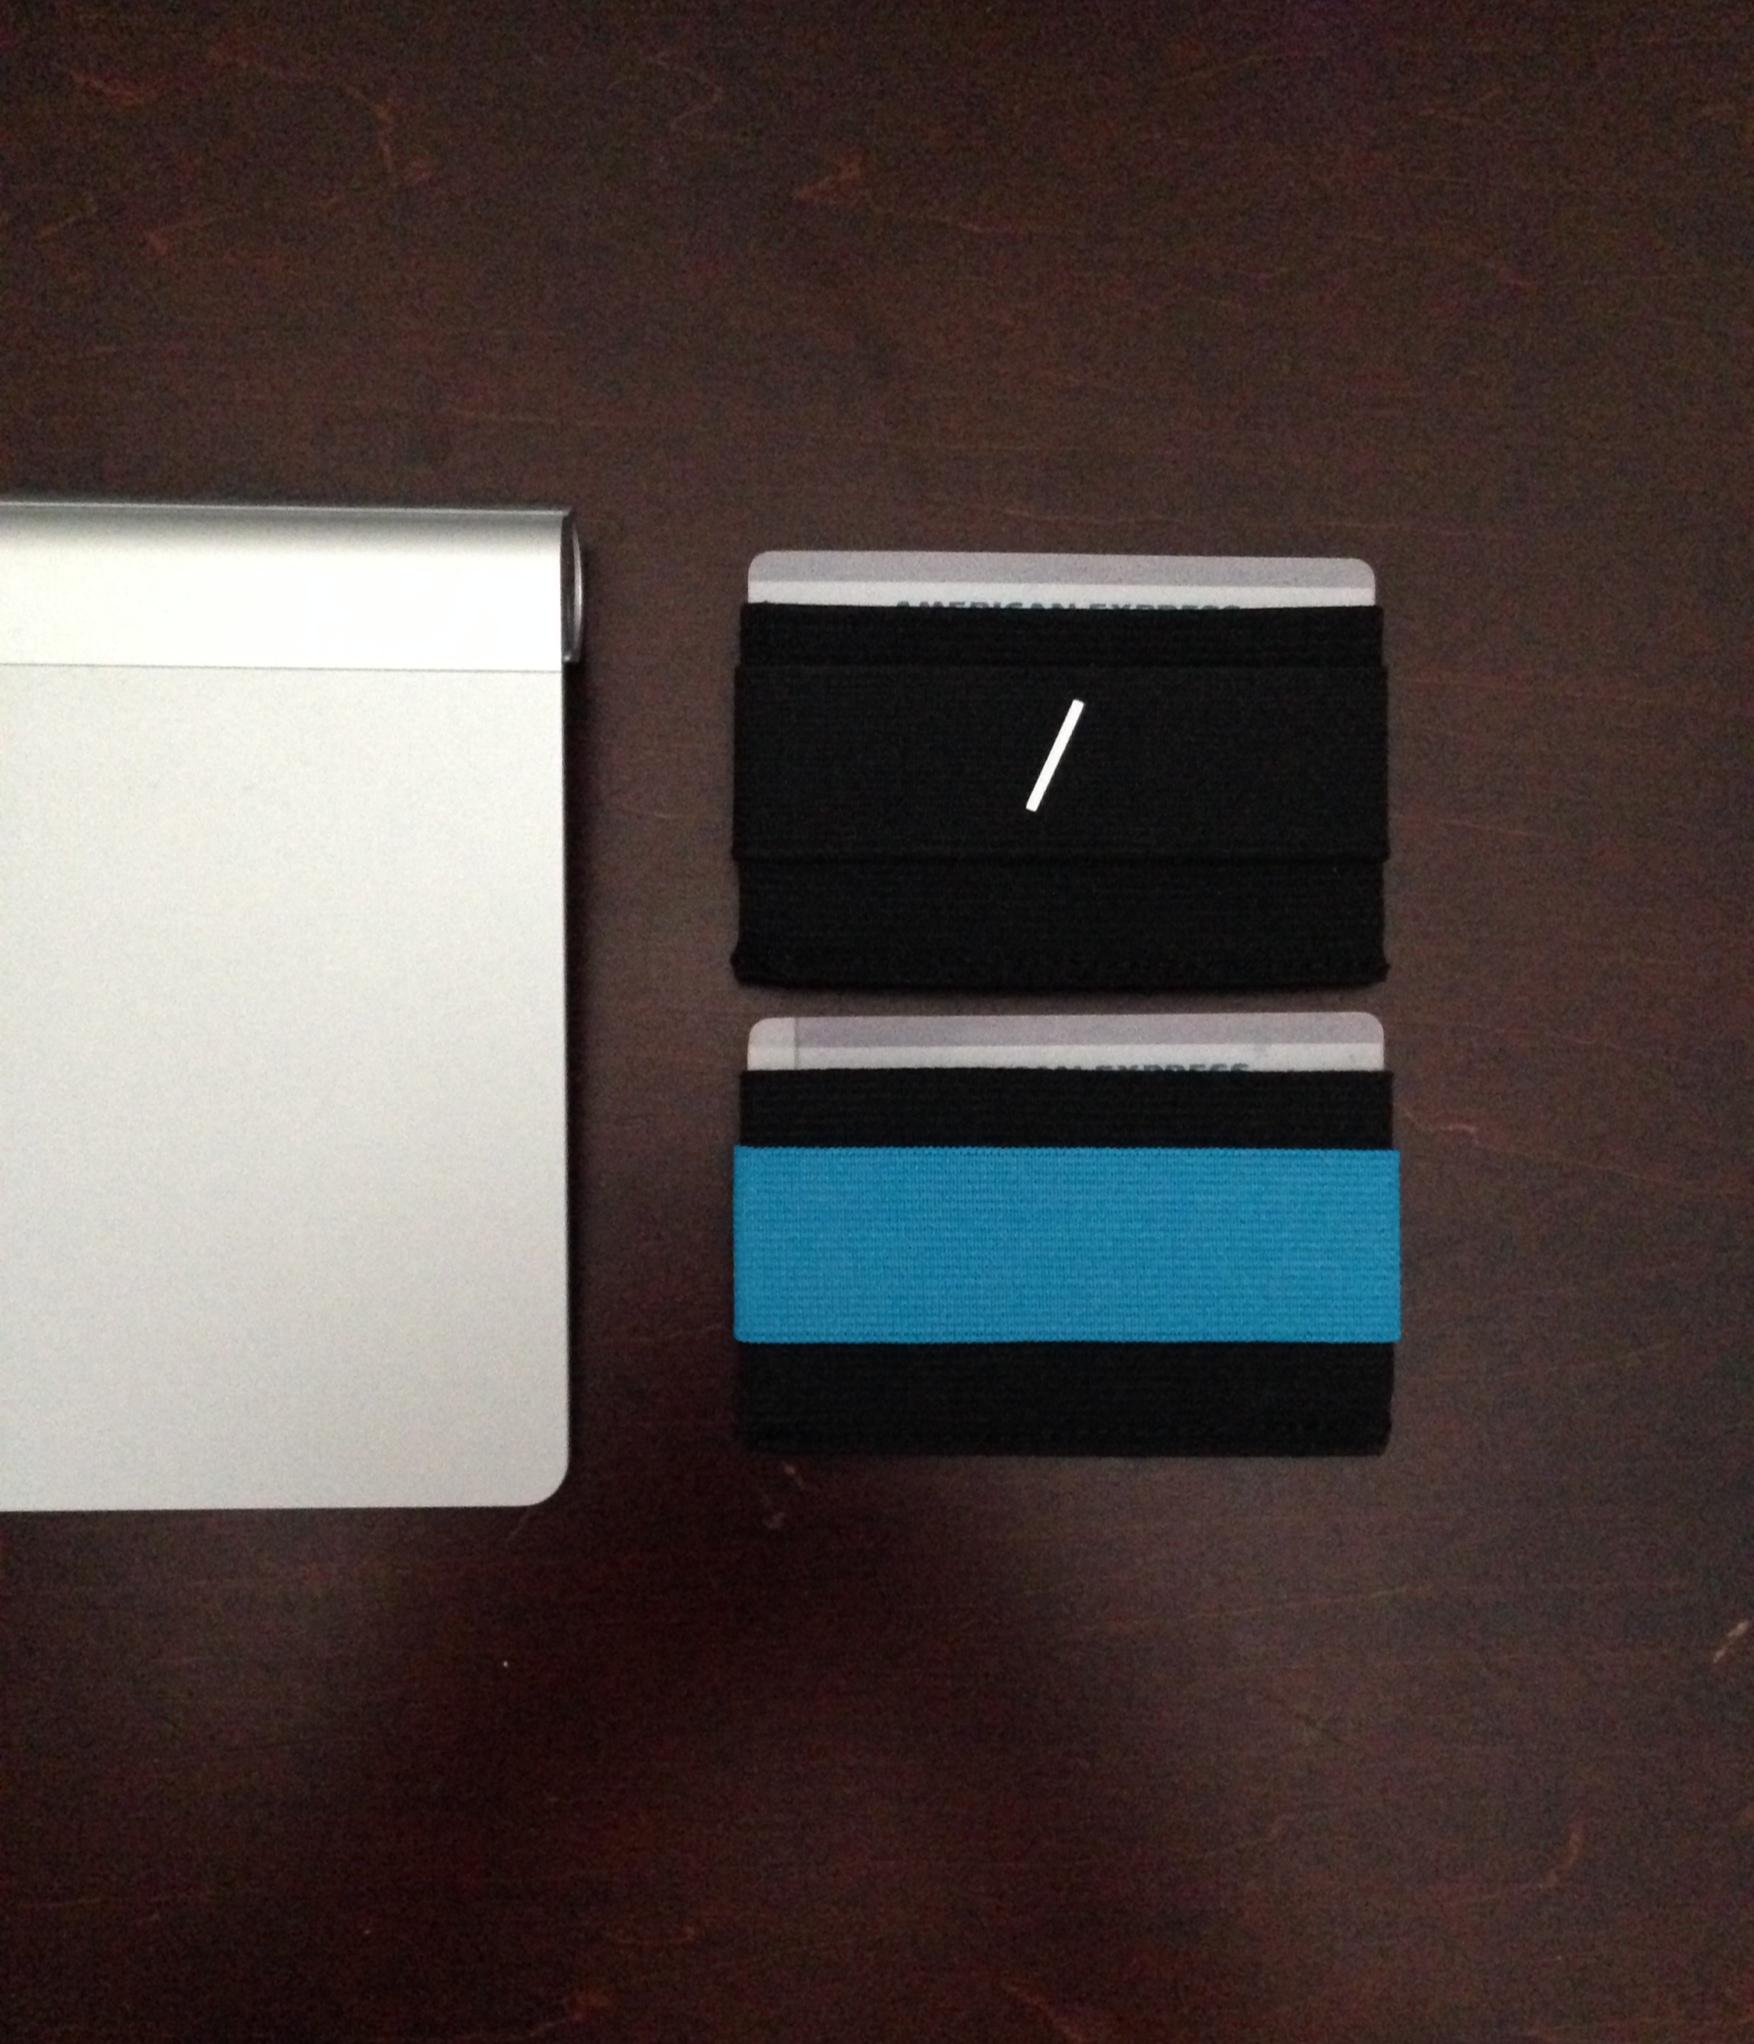 Snapback Slim 2 (top) and Snapback Slim 1 (bottom)